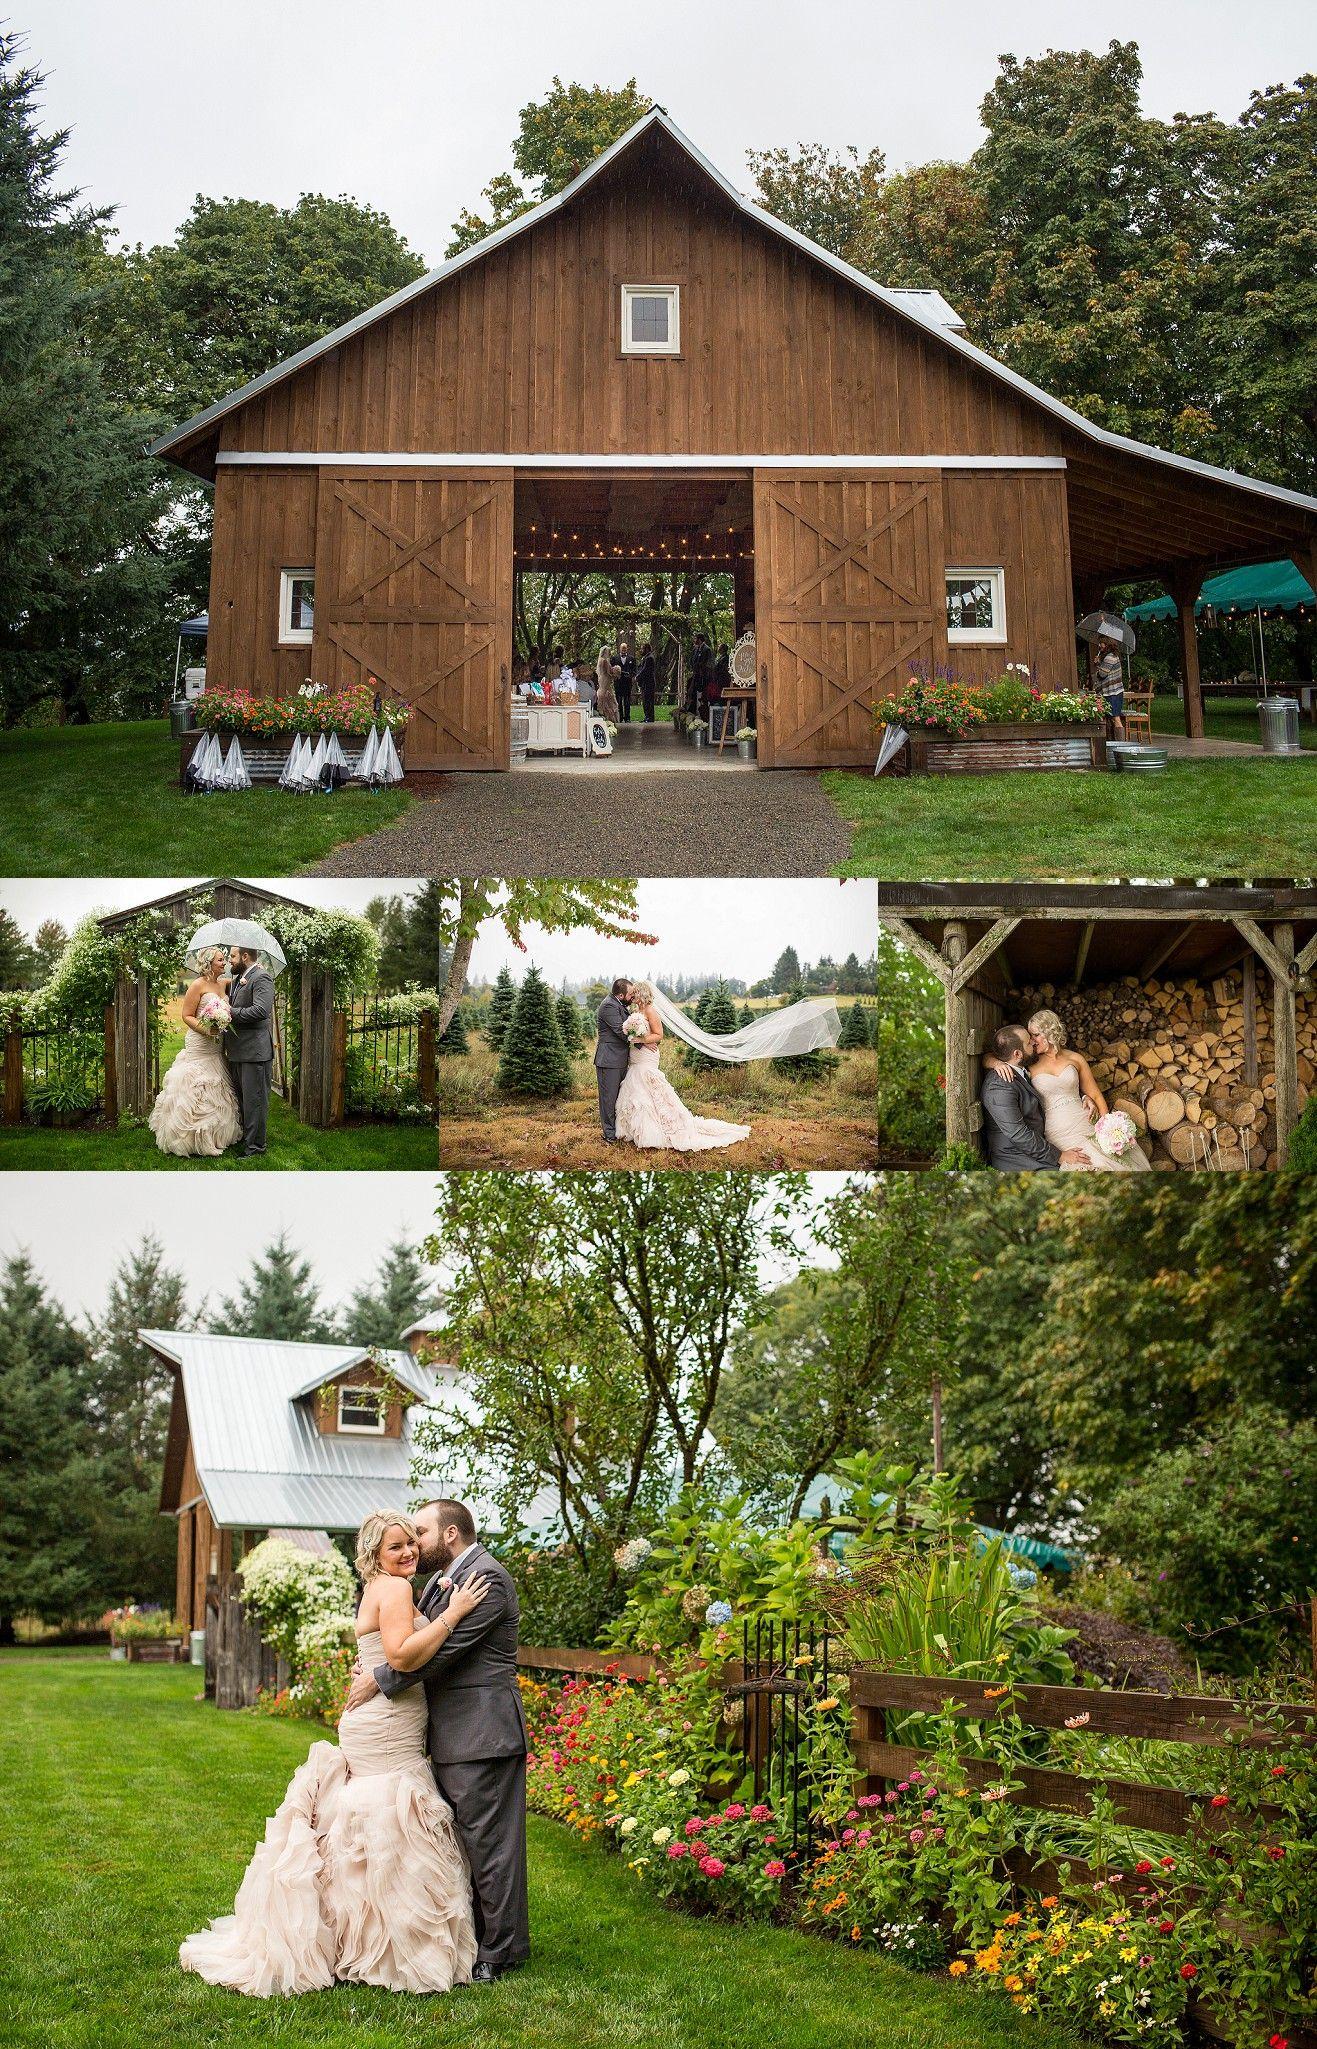 east fork farms in ridgefield washington oregon wedding venues